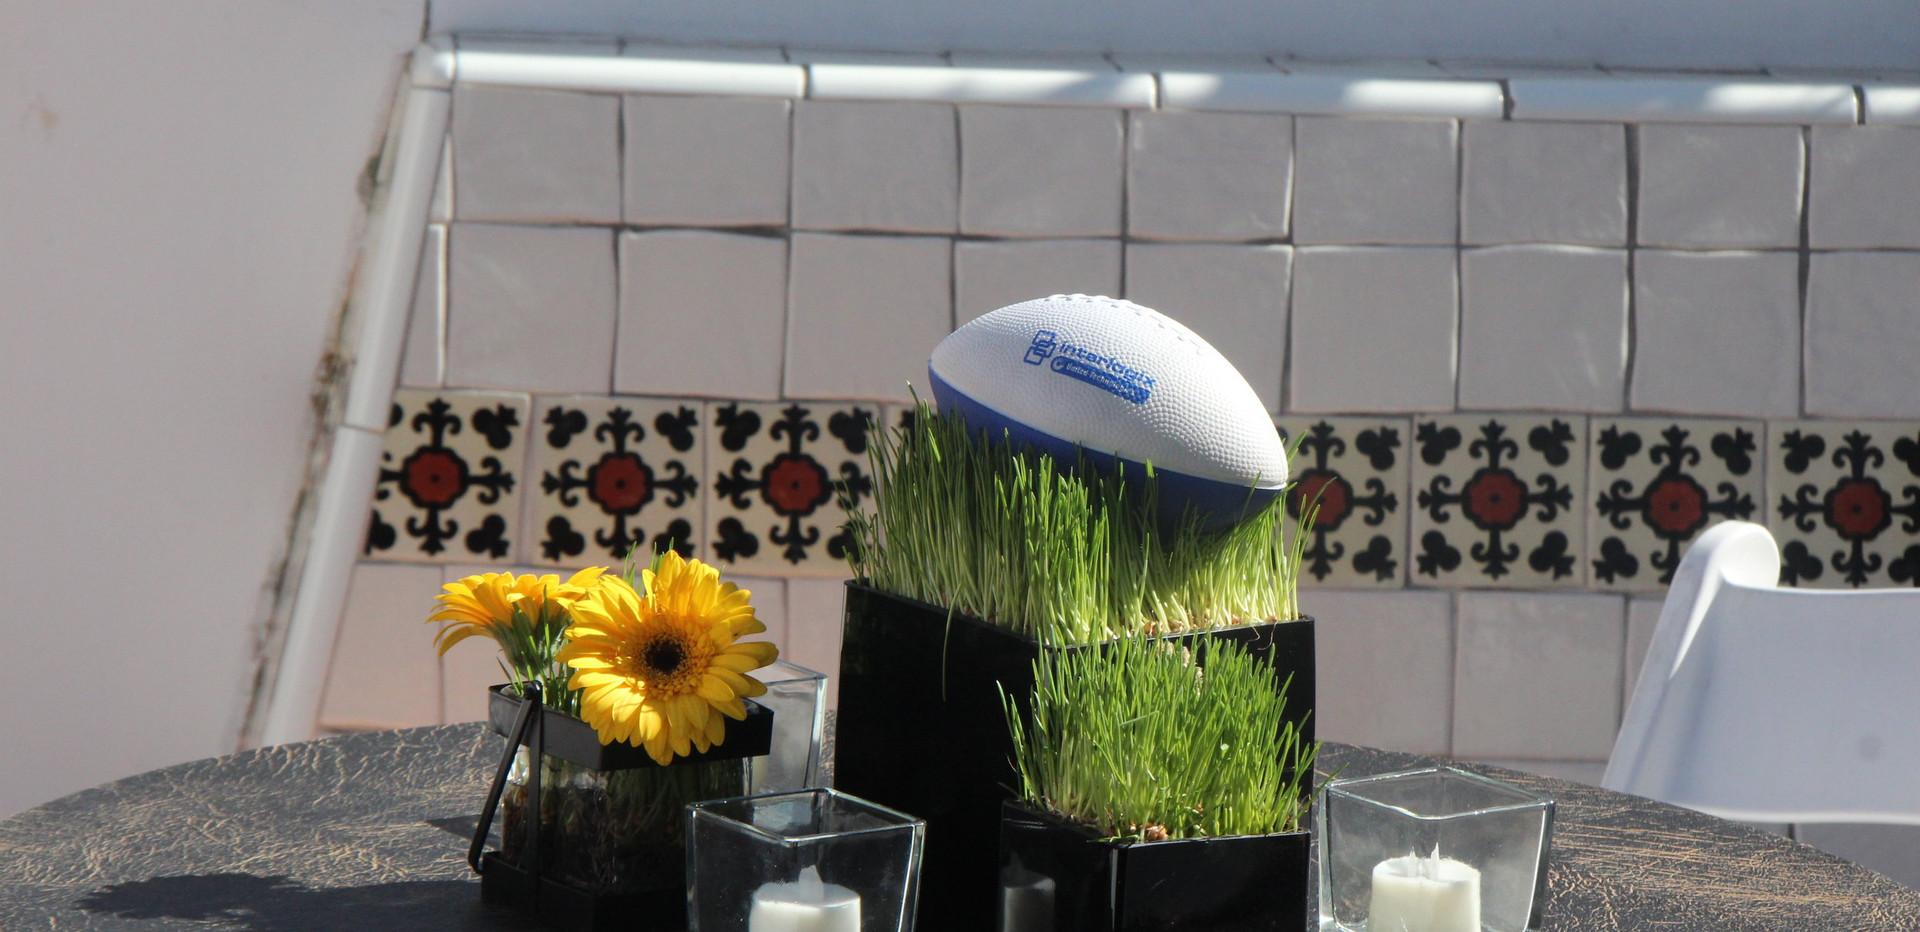 Wheat+Grass+and+Football+(6).jpg